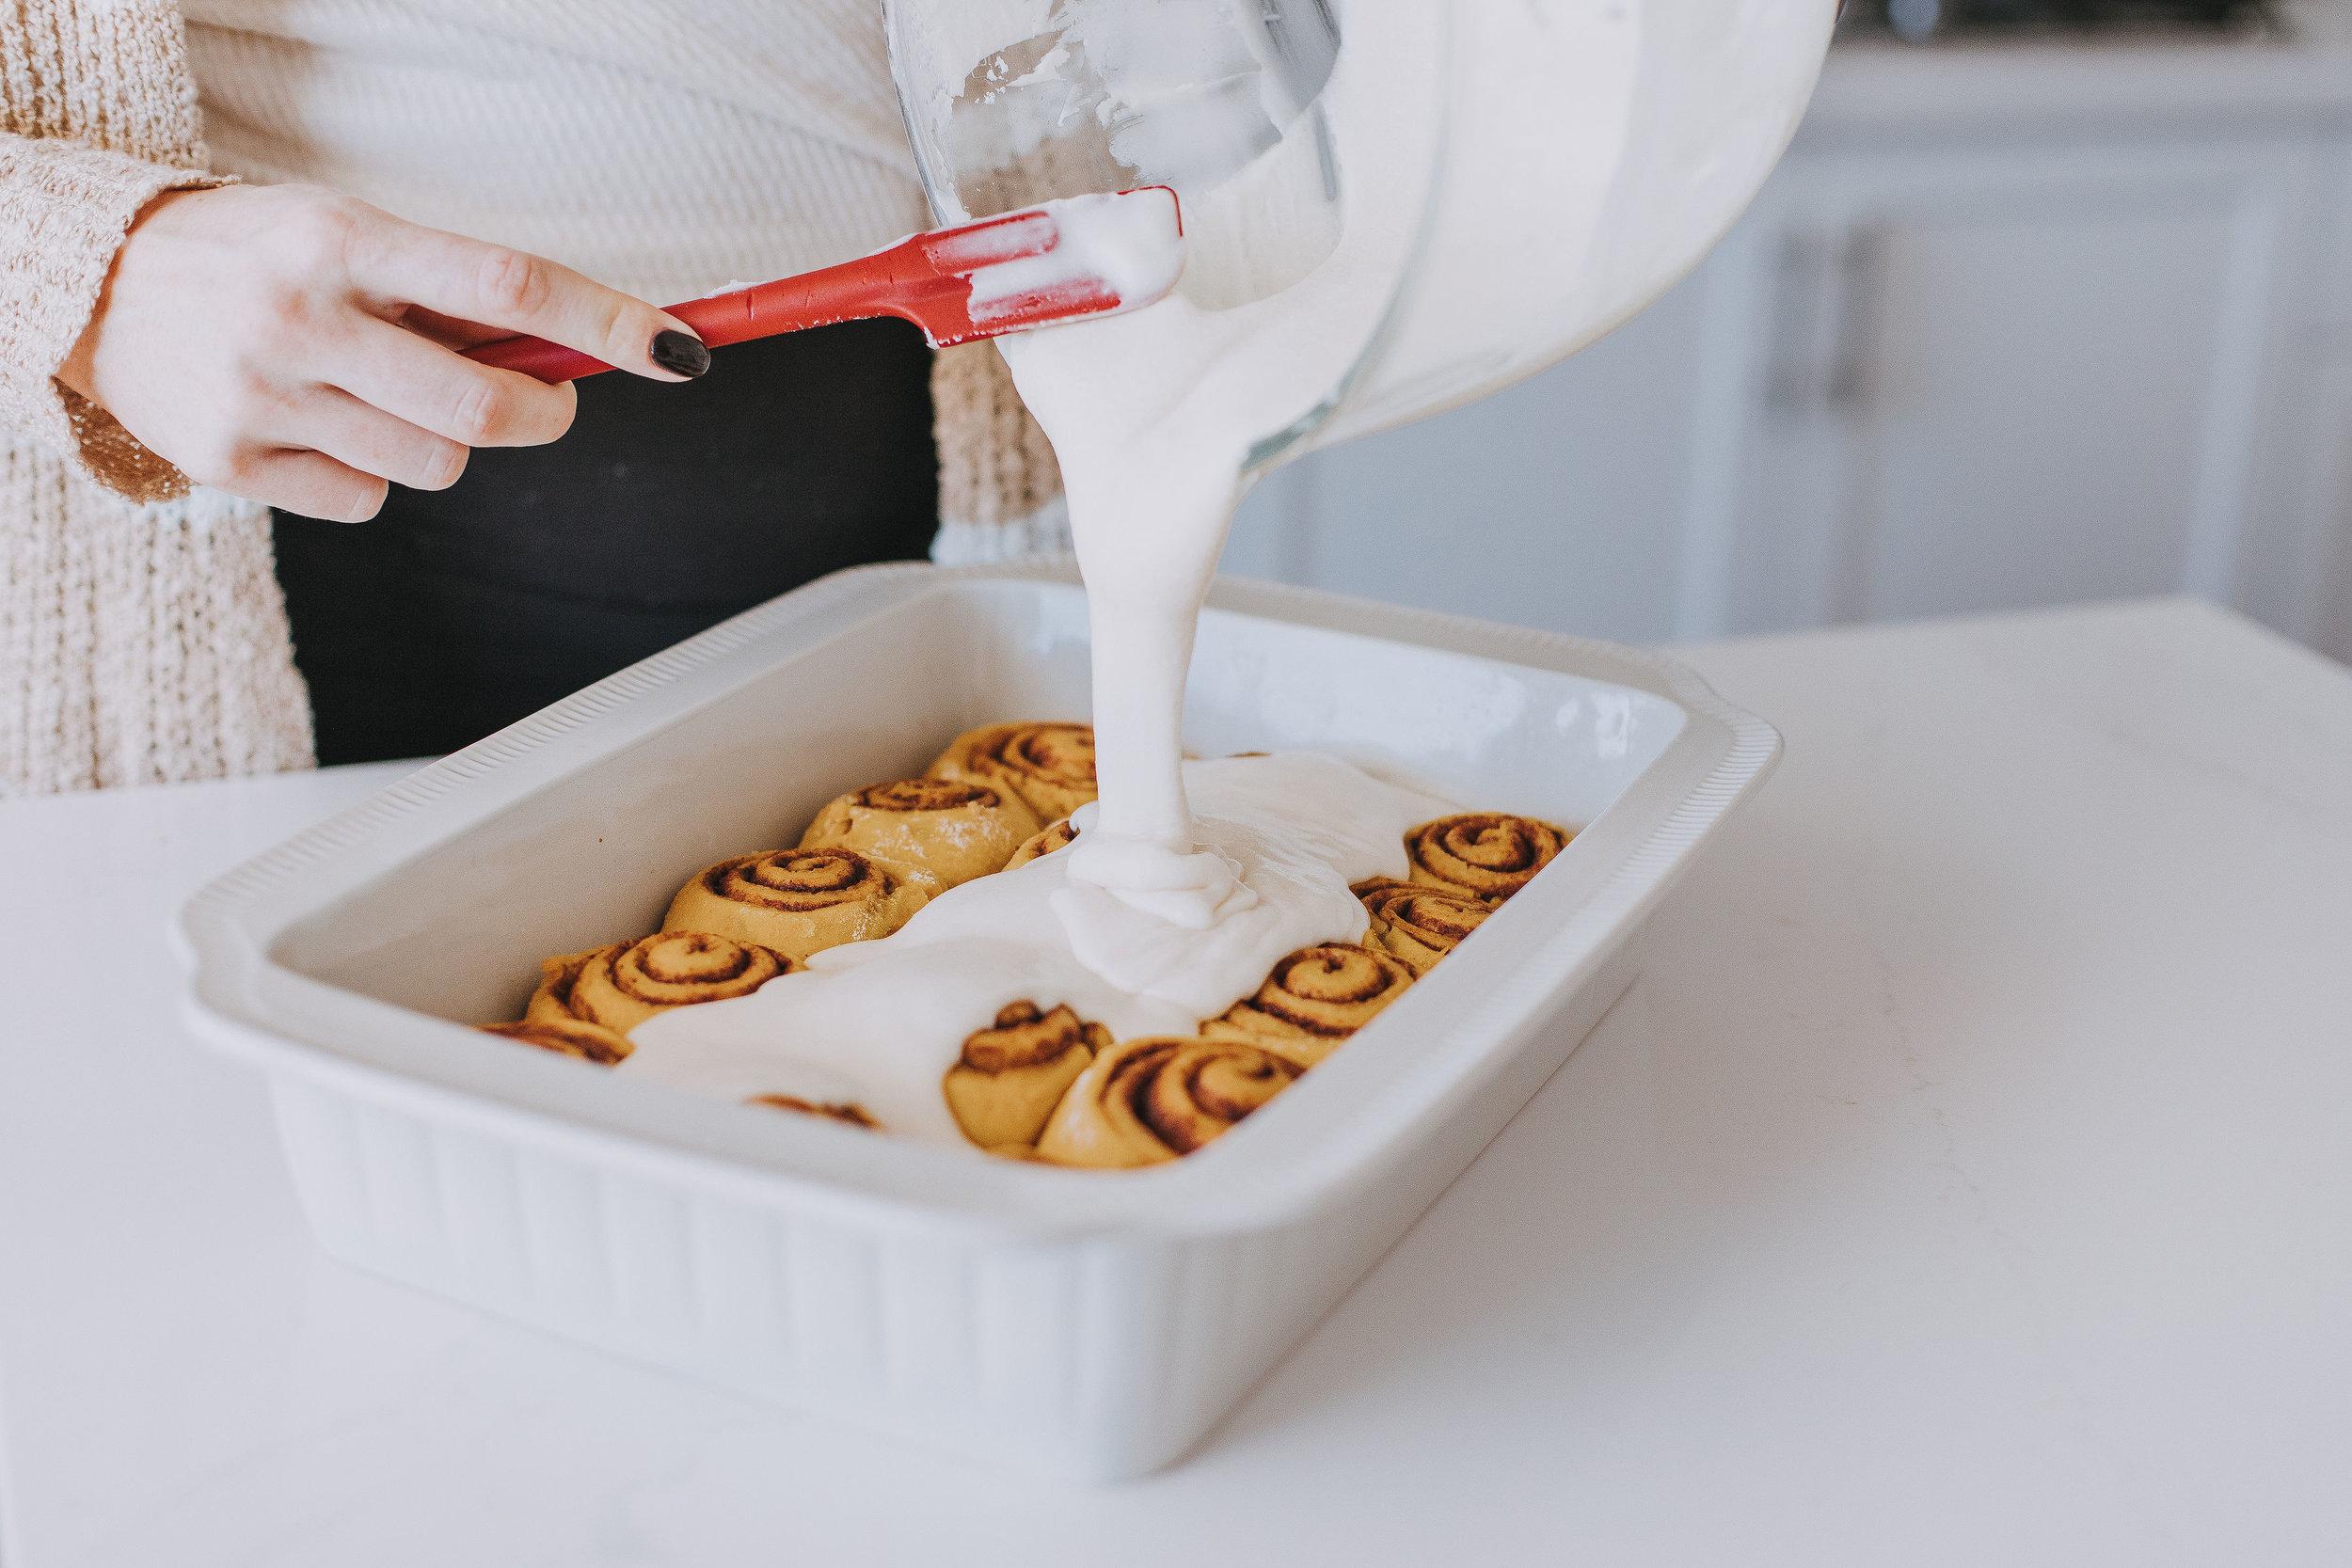 - Filling6 T softened unsalted butter½ C brown sugar1 T ground cinnamon½ tsp ground nutmeg½ tsp ground cloves¼ tsp ground allspice